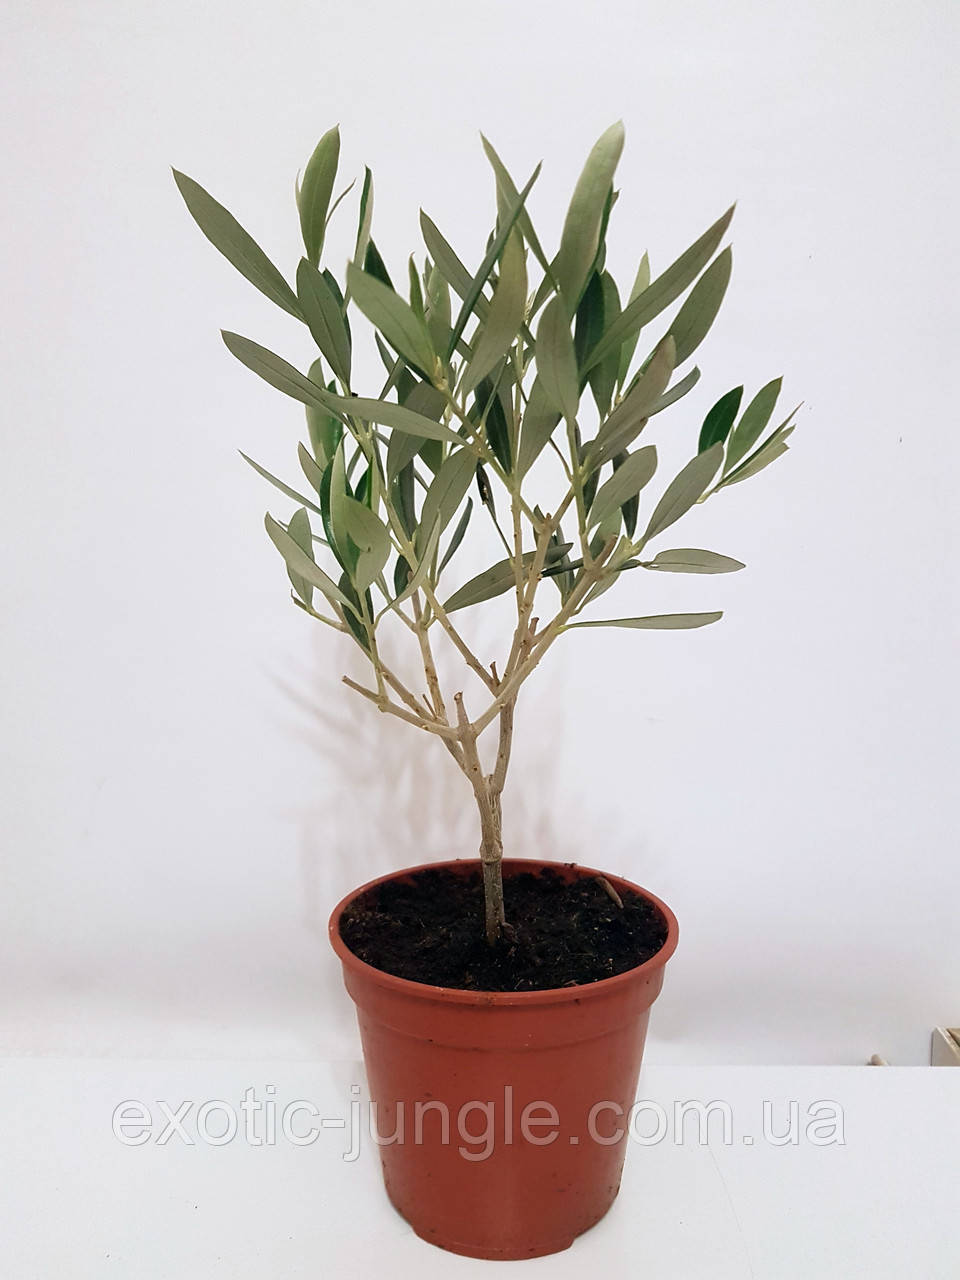 Олива европейская (Olea europaea) 40-50 см. Комнатная (Италия)